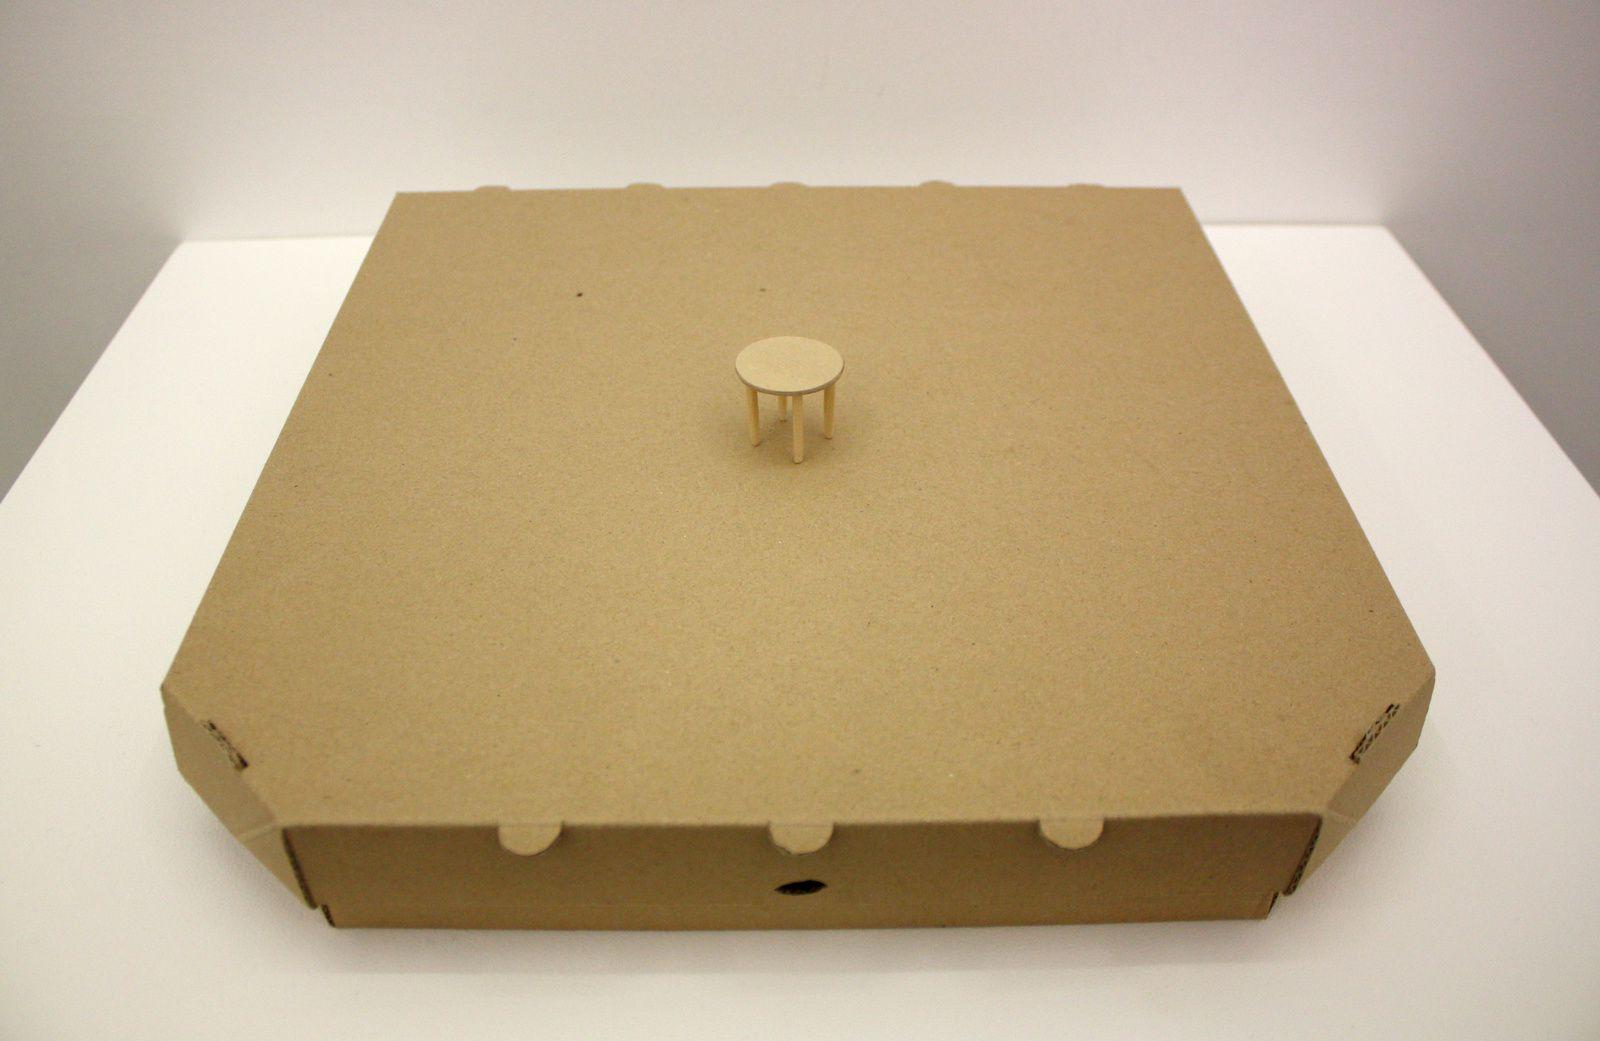 Pizza 1 personne, 2012